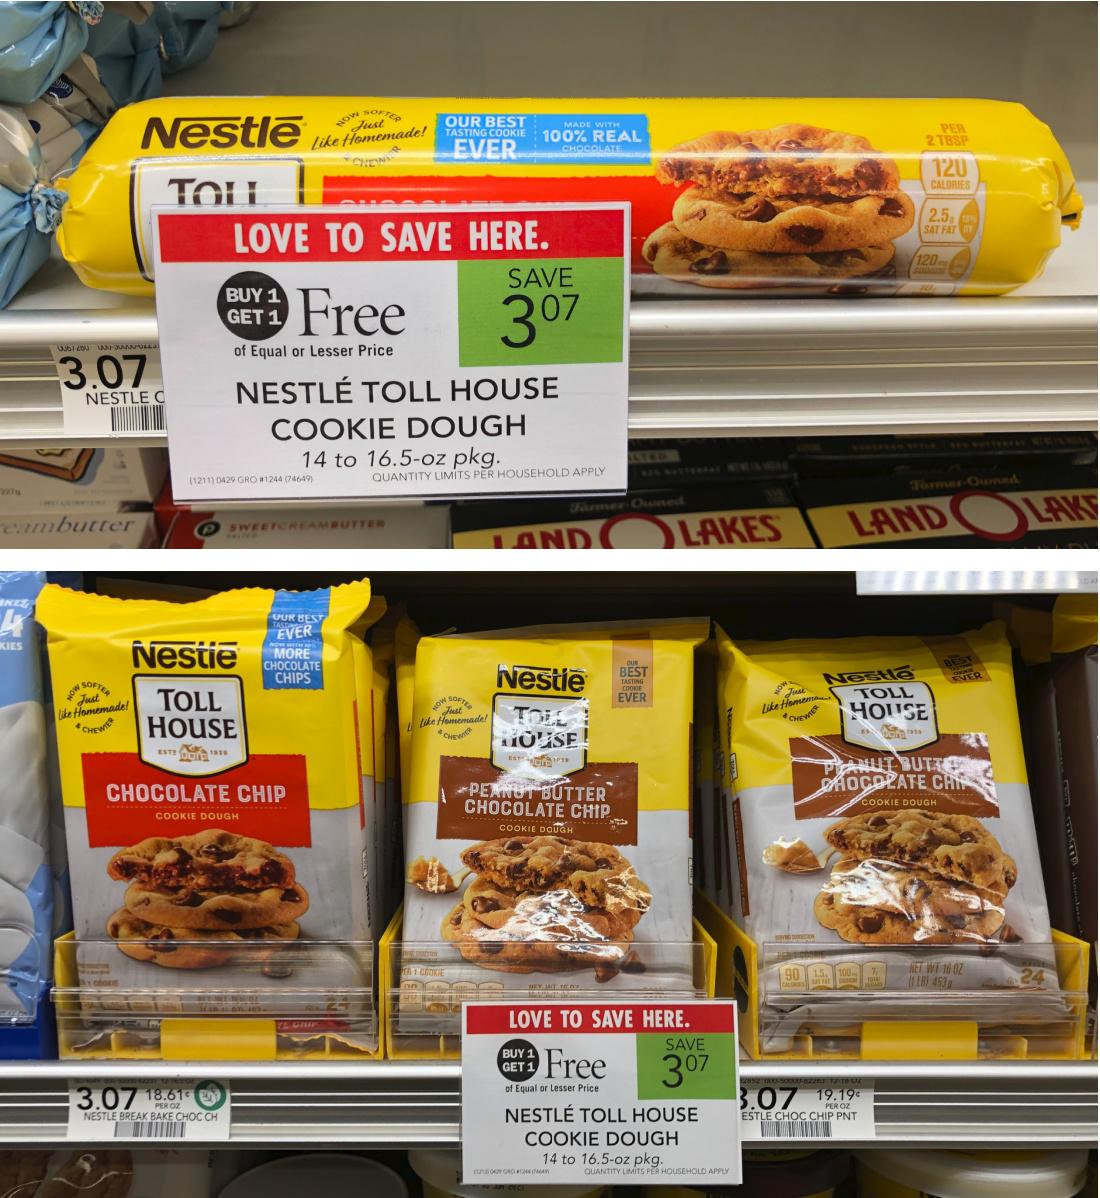 Nestle Toll House Cookie Dough Just $1.54 At Publix on I Heart Publix 1